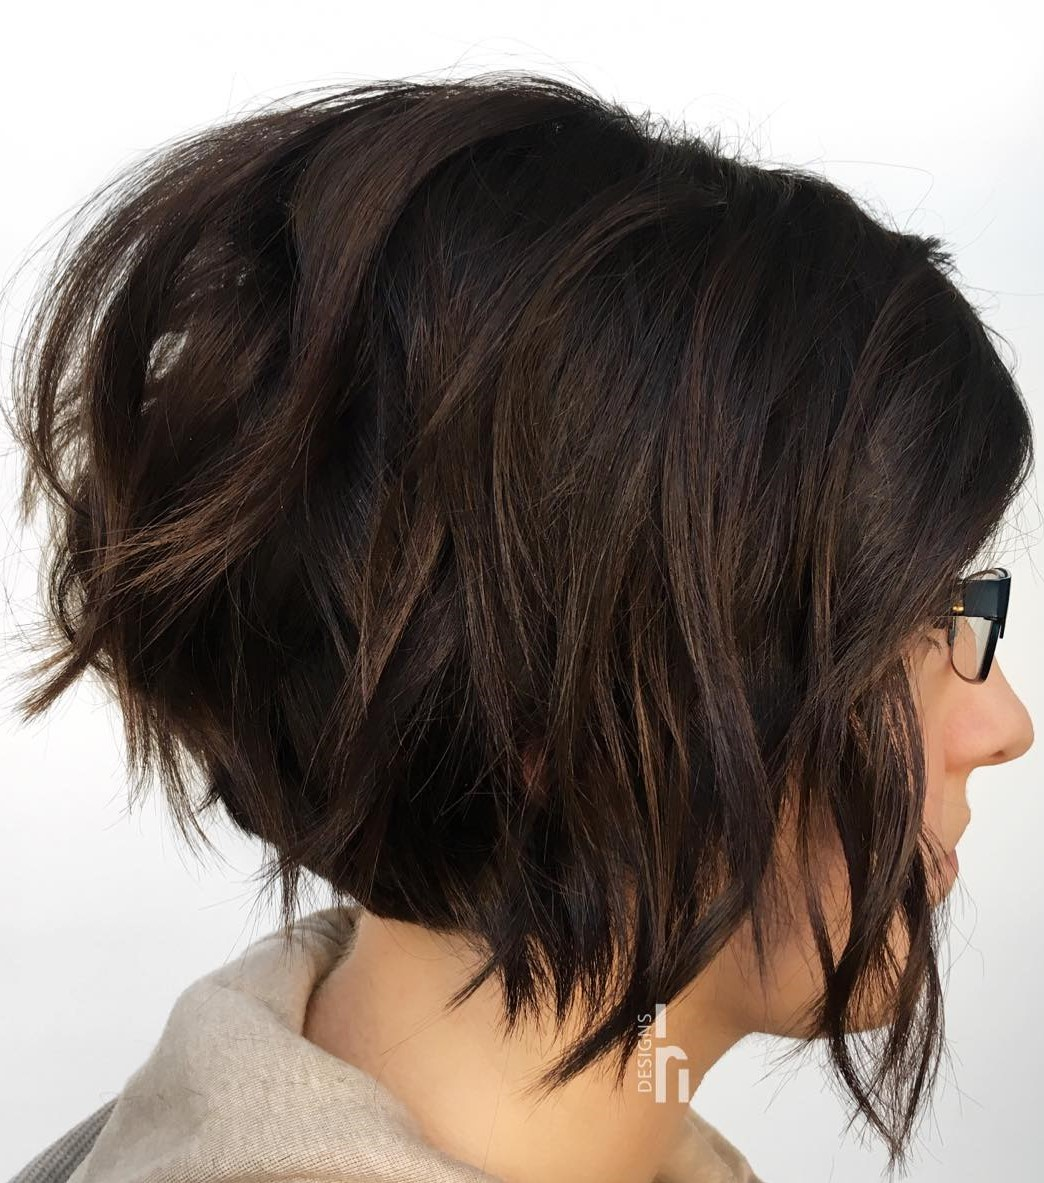 Edgy Wavy Pixie Bob Haircut